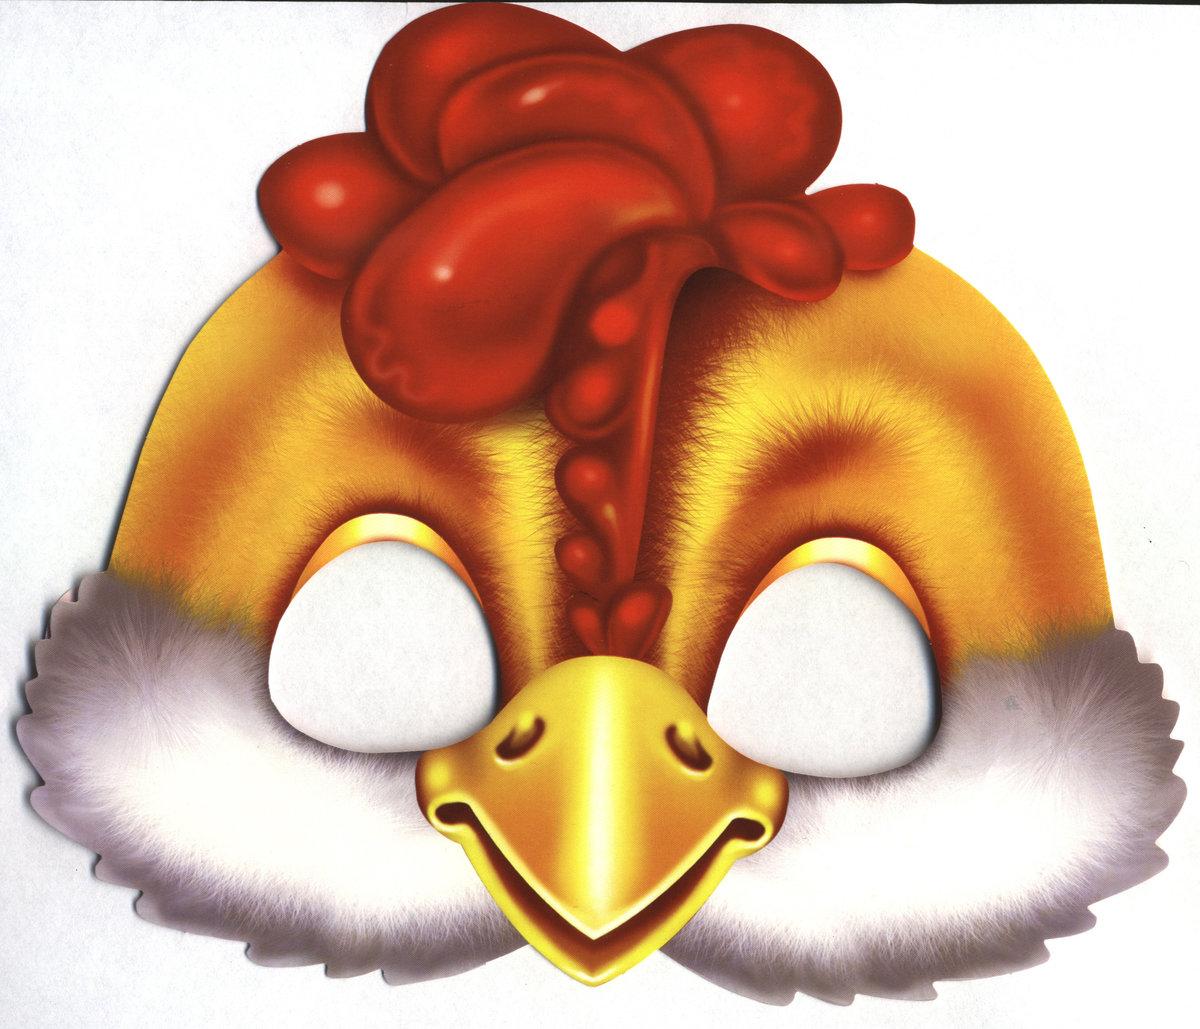 еще картинки маски курицы на голову агентств недвижимости